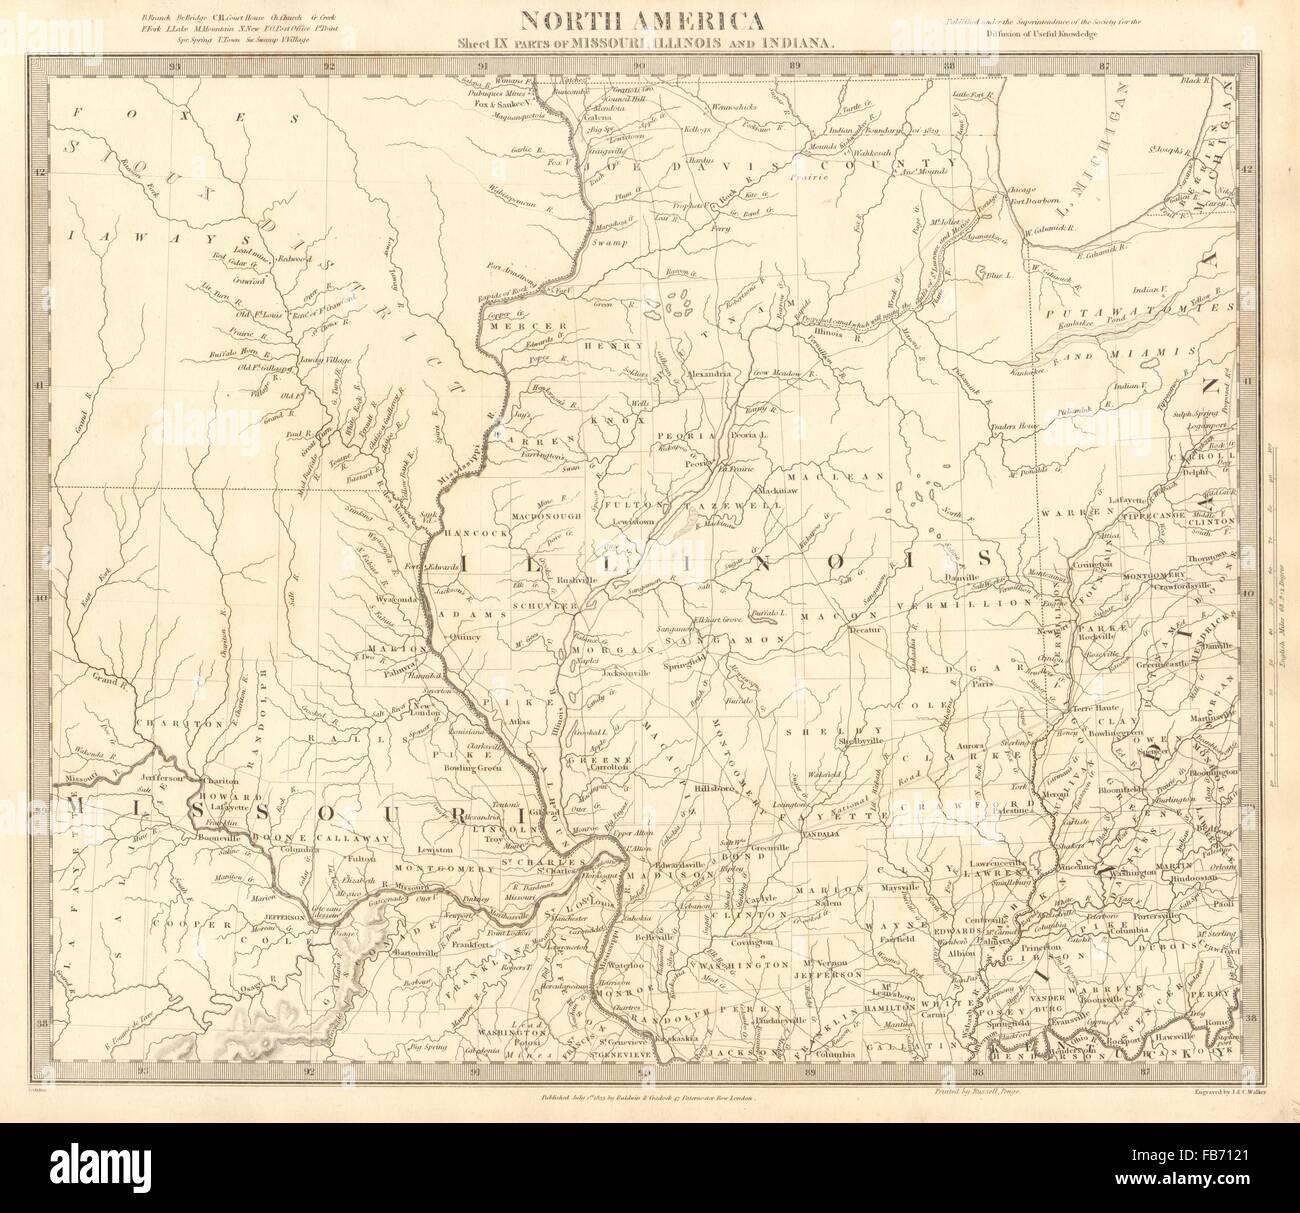 Indianerstamme Nordamerikas Karte.Usa Missouri Illinois Indiana Indianerstamme Dorfer